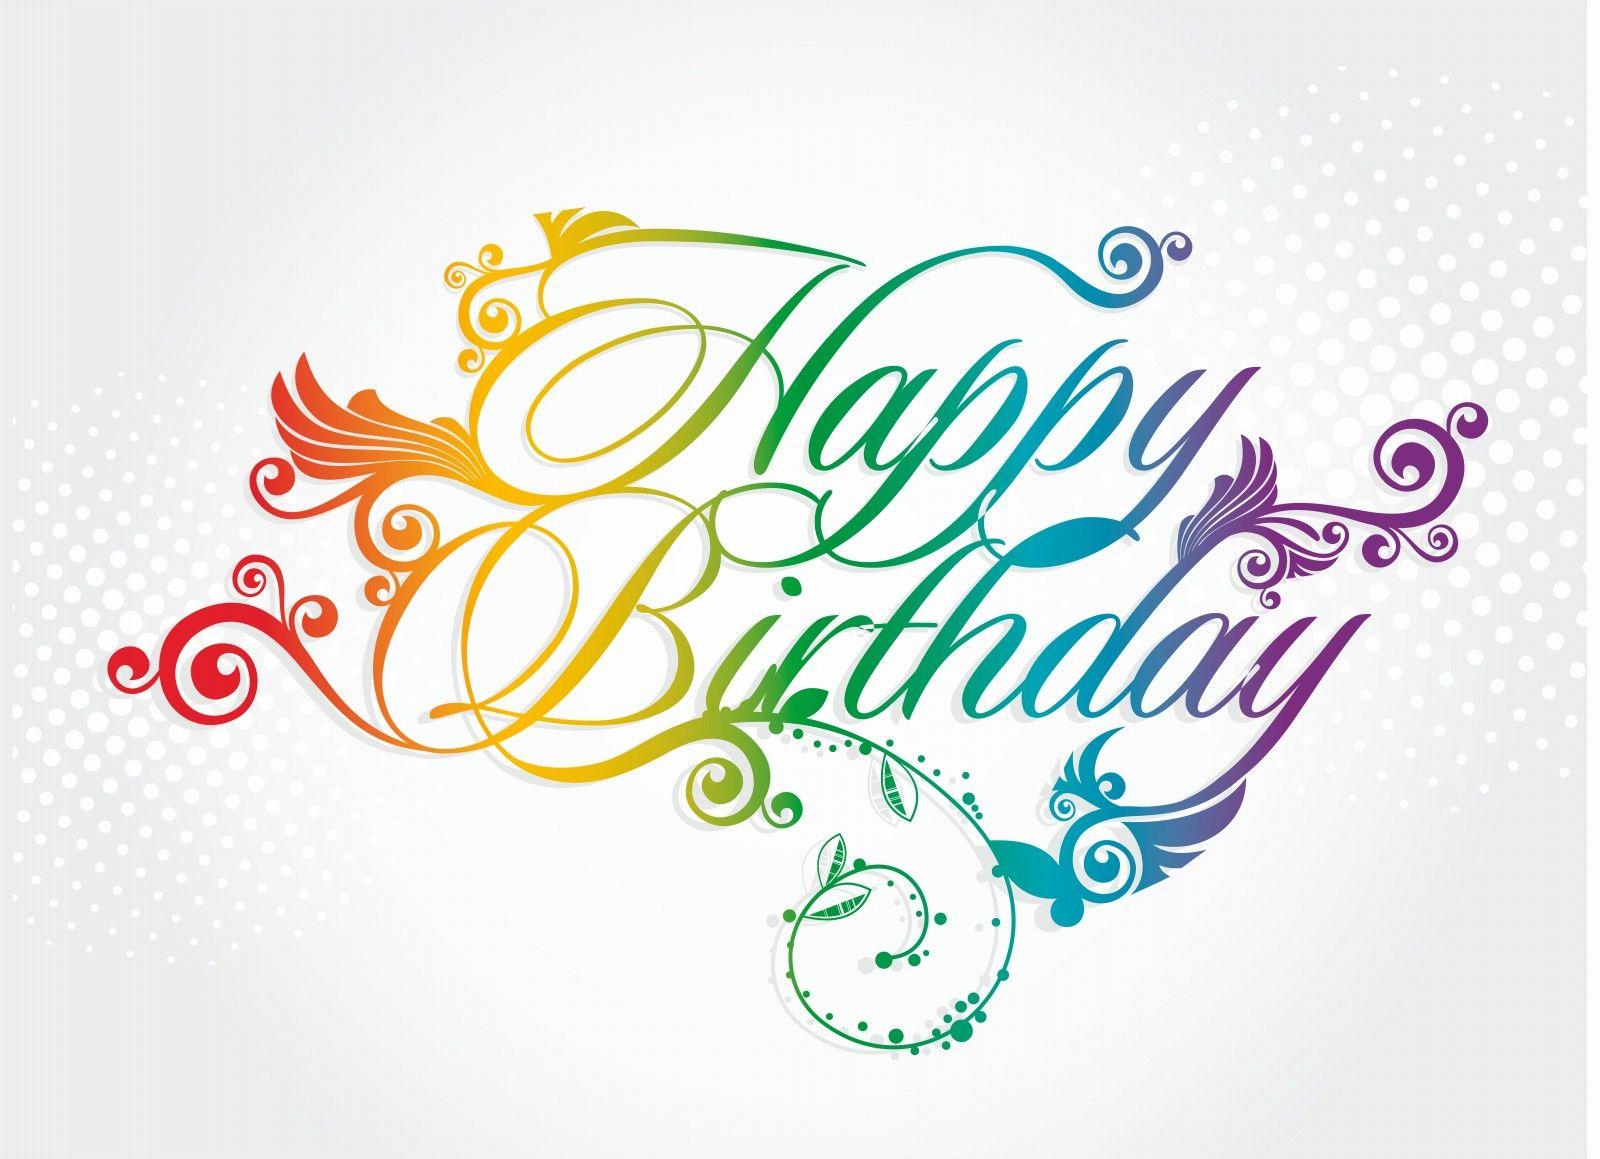 Biography Vassar Lyle Allen Born 1868 Http Alabamapioneers Com Biography Vassar Lyle All Happy Birthday Text Happy Birthday Png Happy Birthday Card Design Ideas for happy birthday text image png